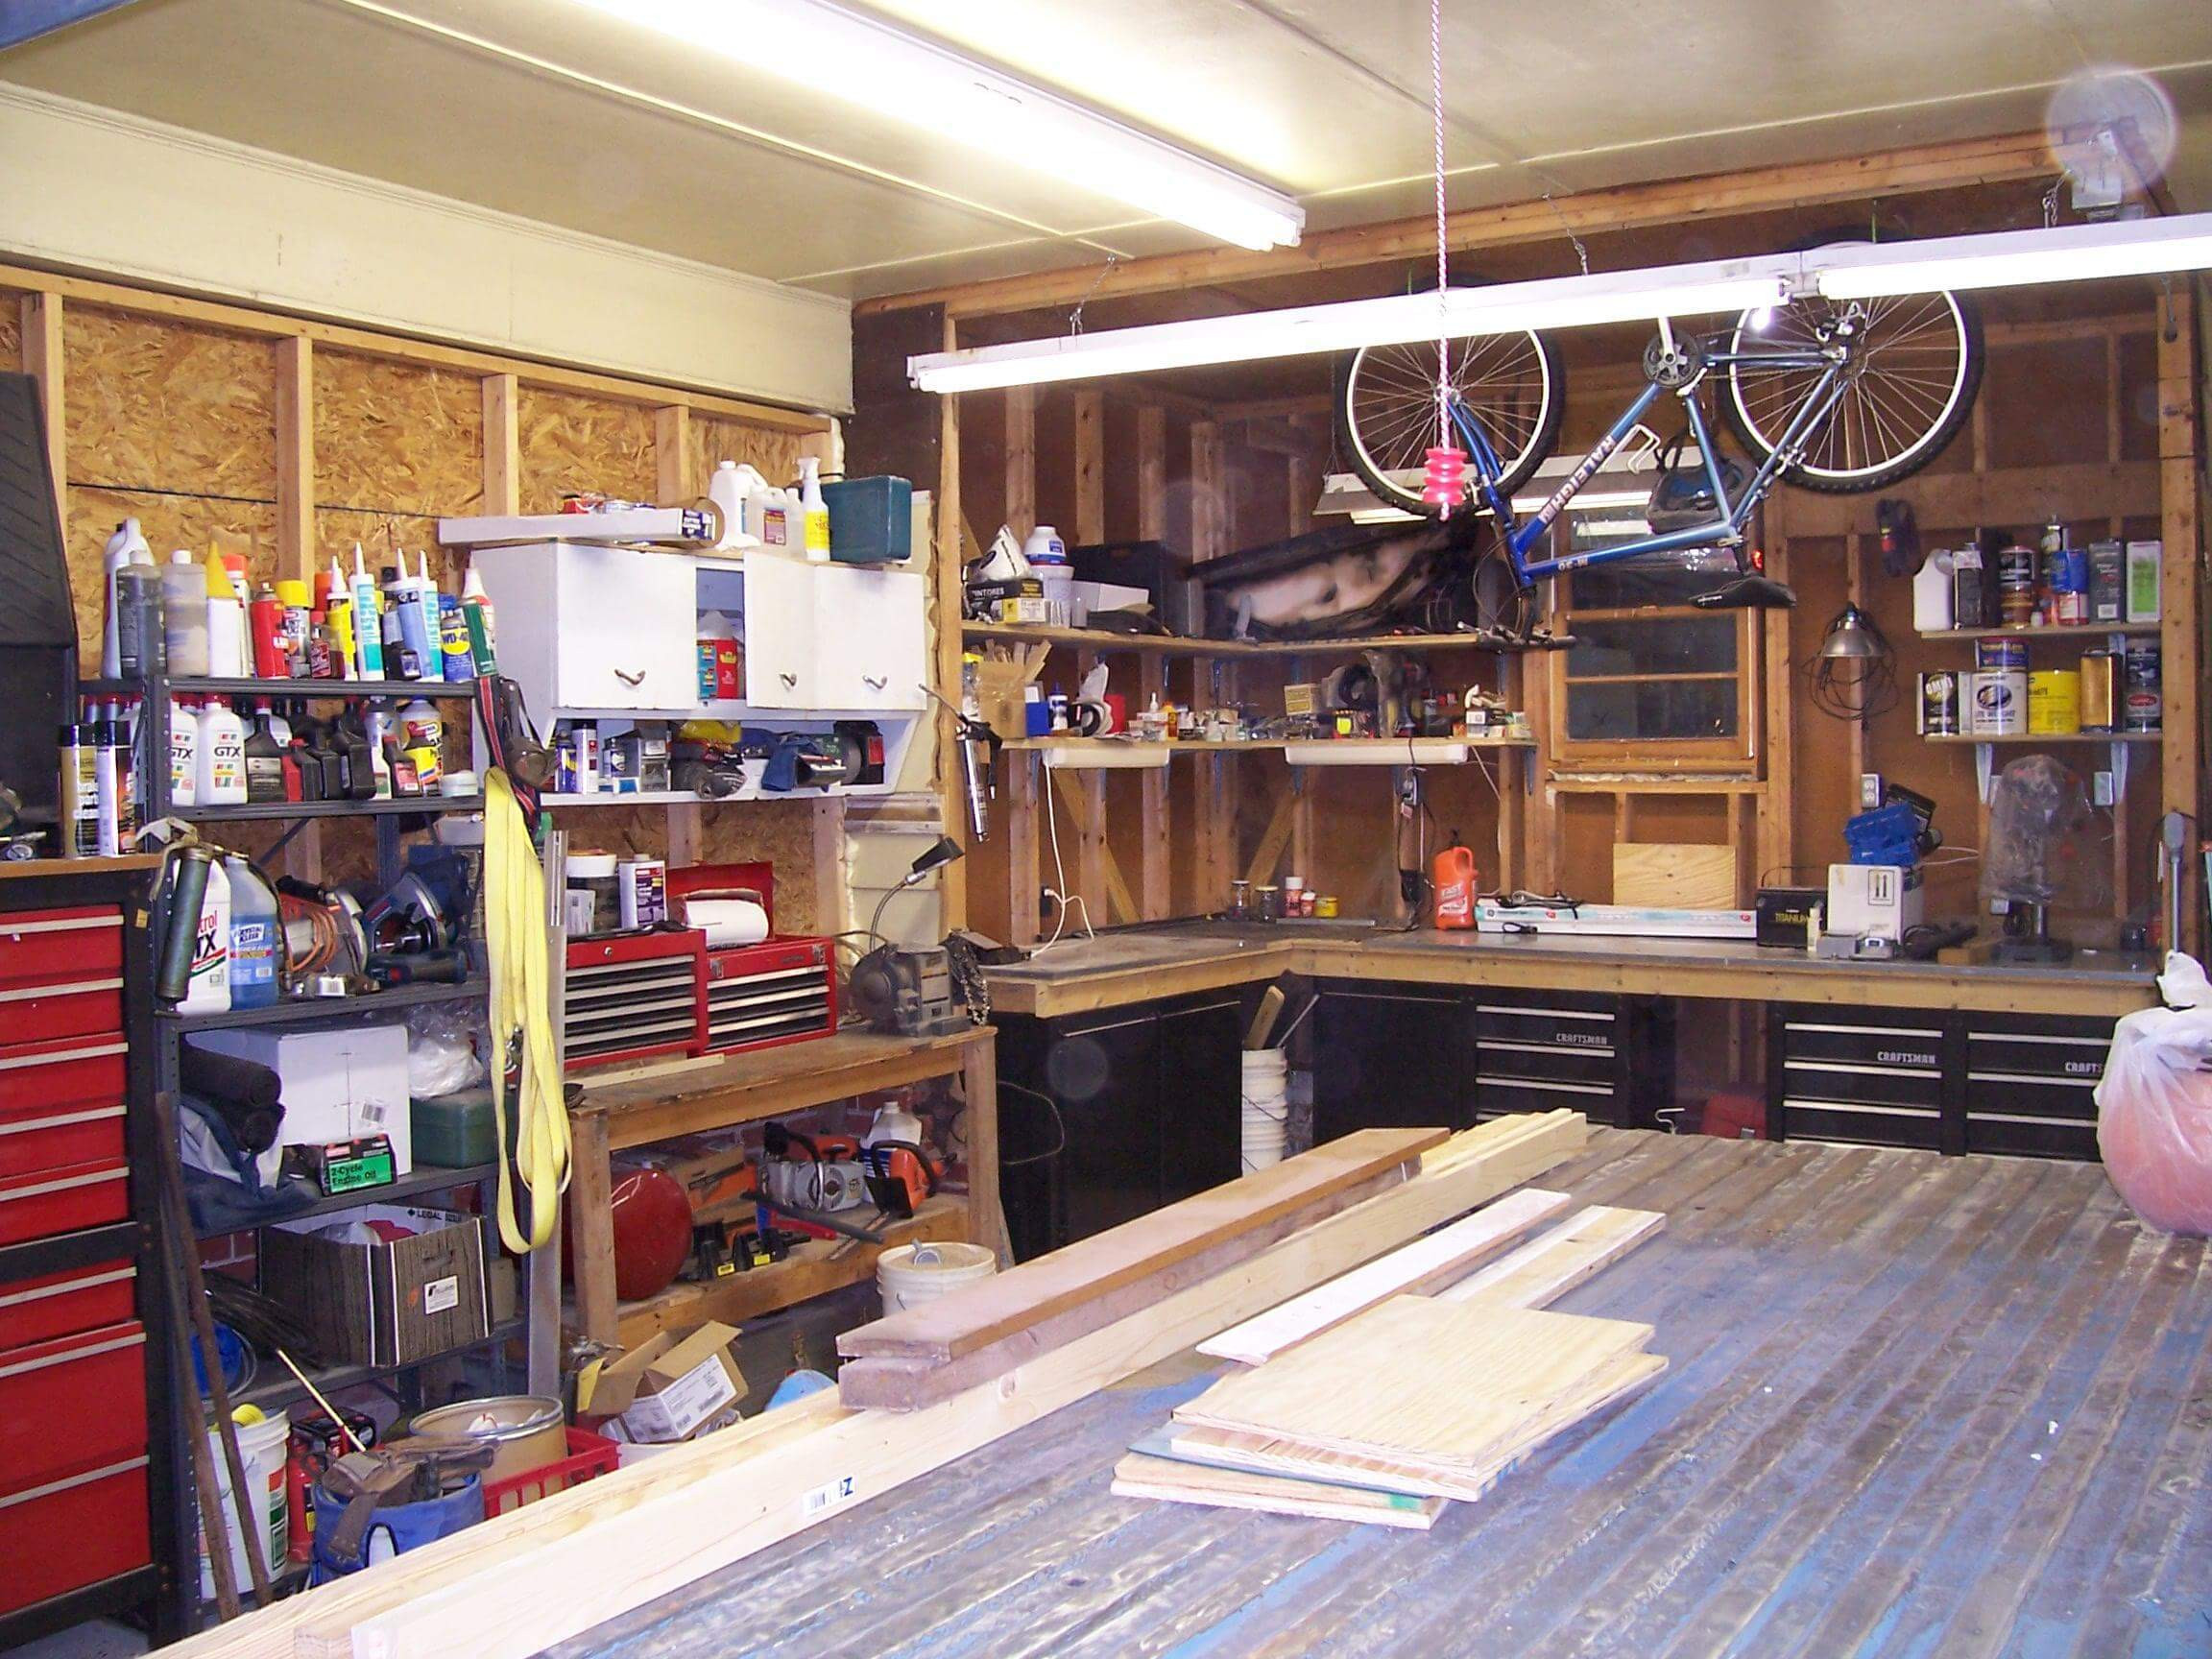 Garage Organization Home Depot  Garage Organization Tips to Make Yours be Useful